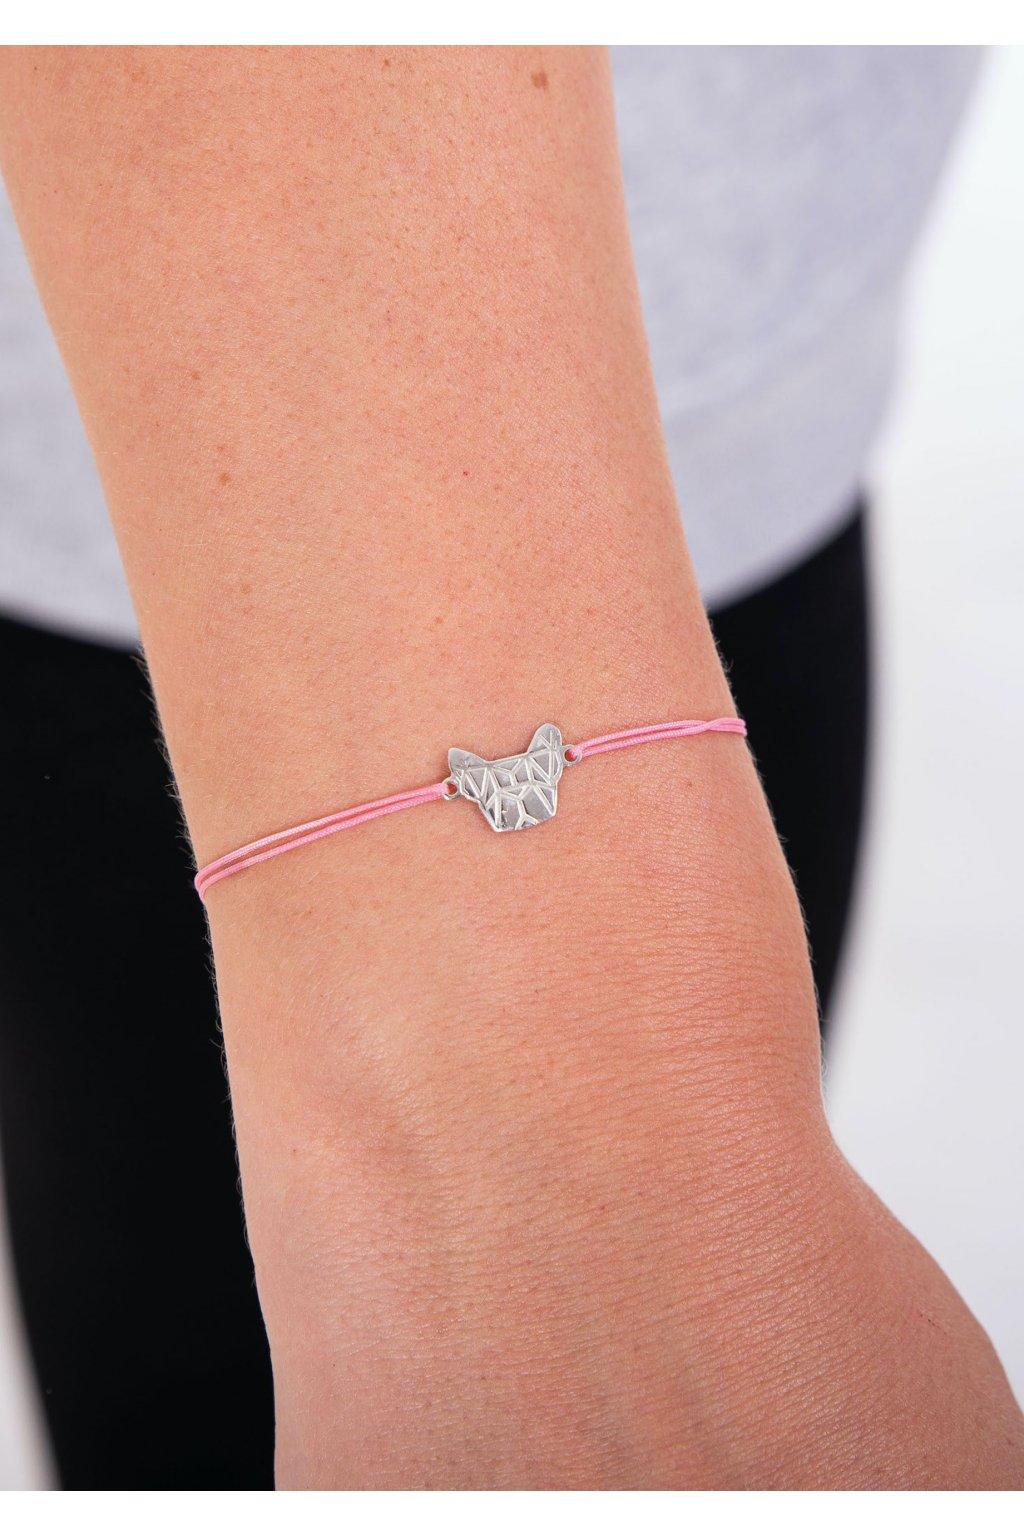 Náramek GEO stříbrný + růžová šňůrka